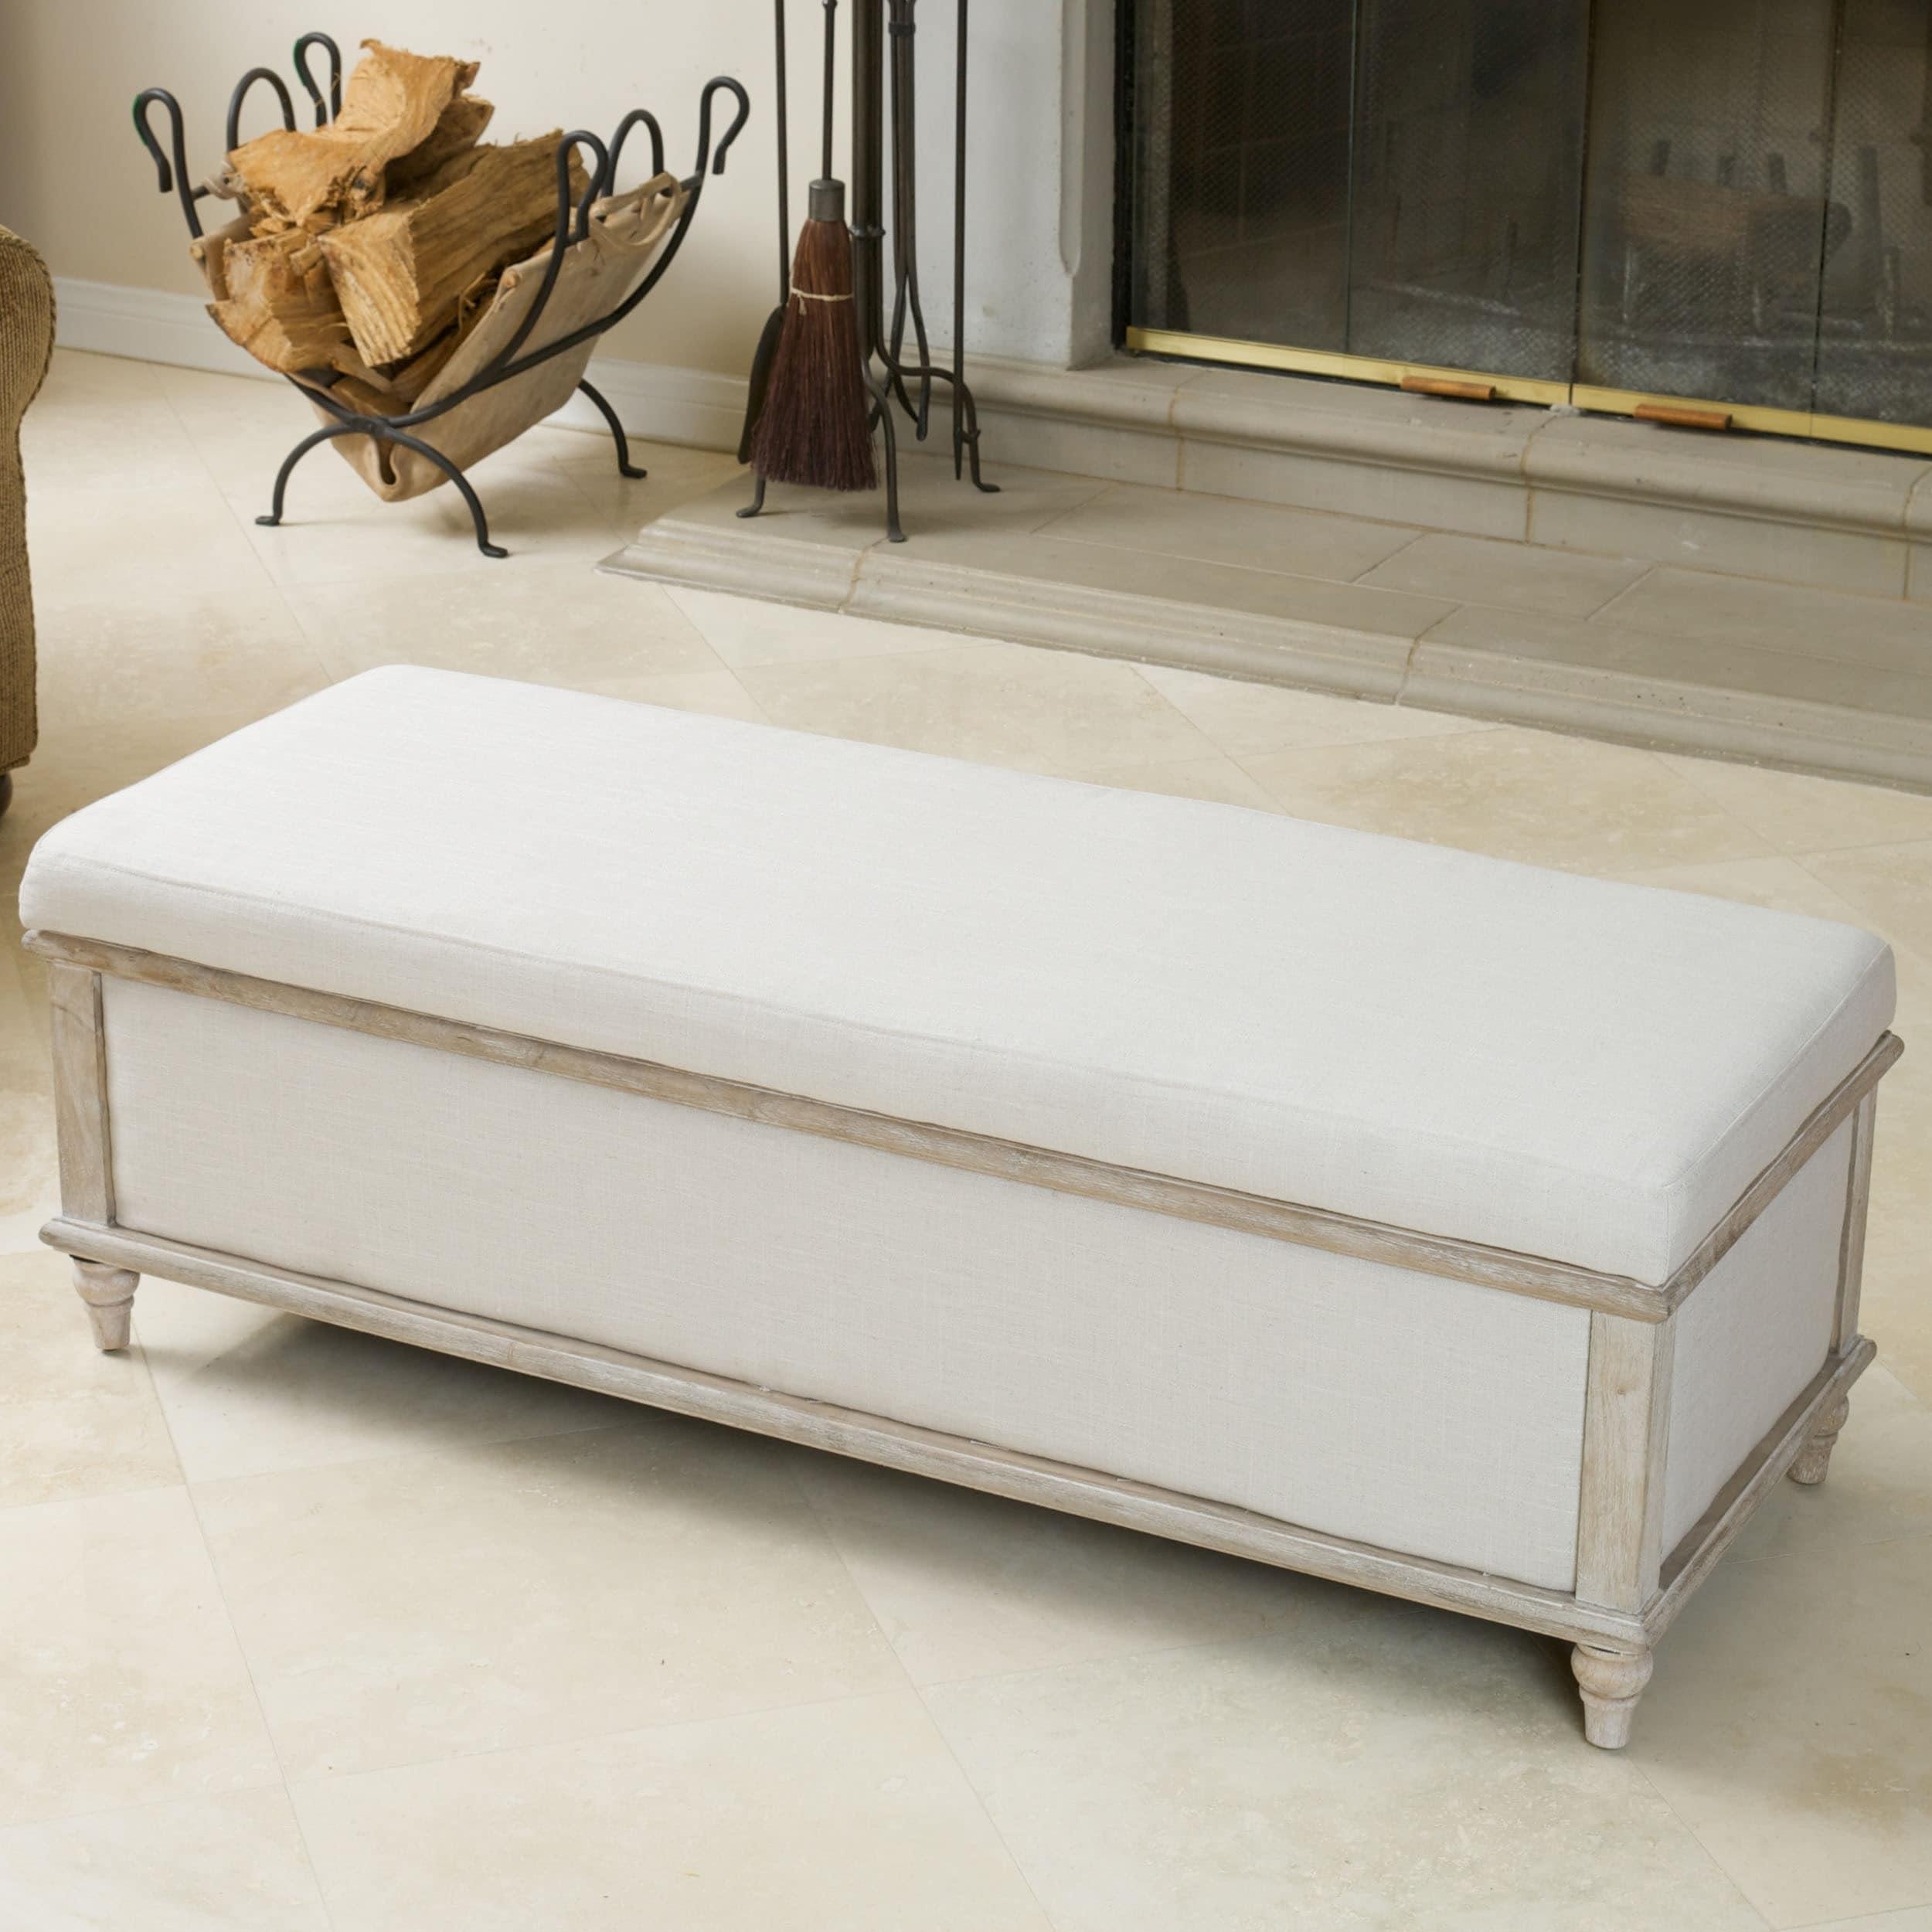 Abilene Light Beige Fabric Storage Ottoman Bench by Chris...